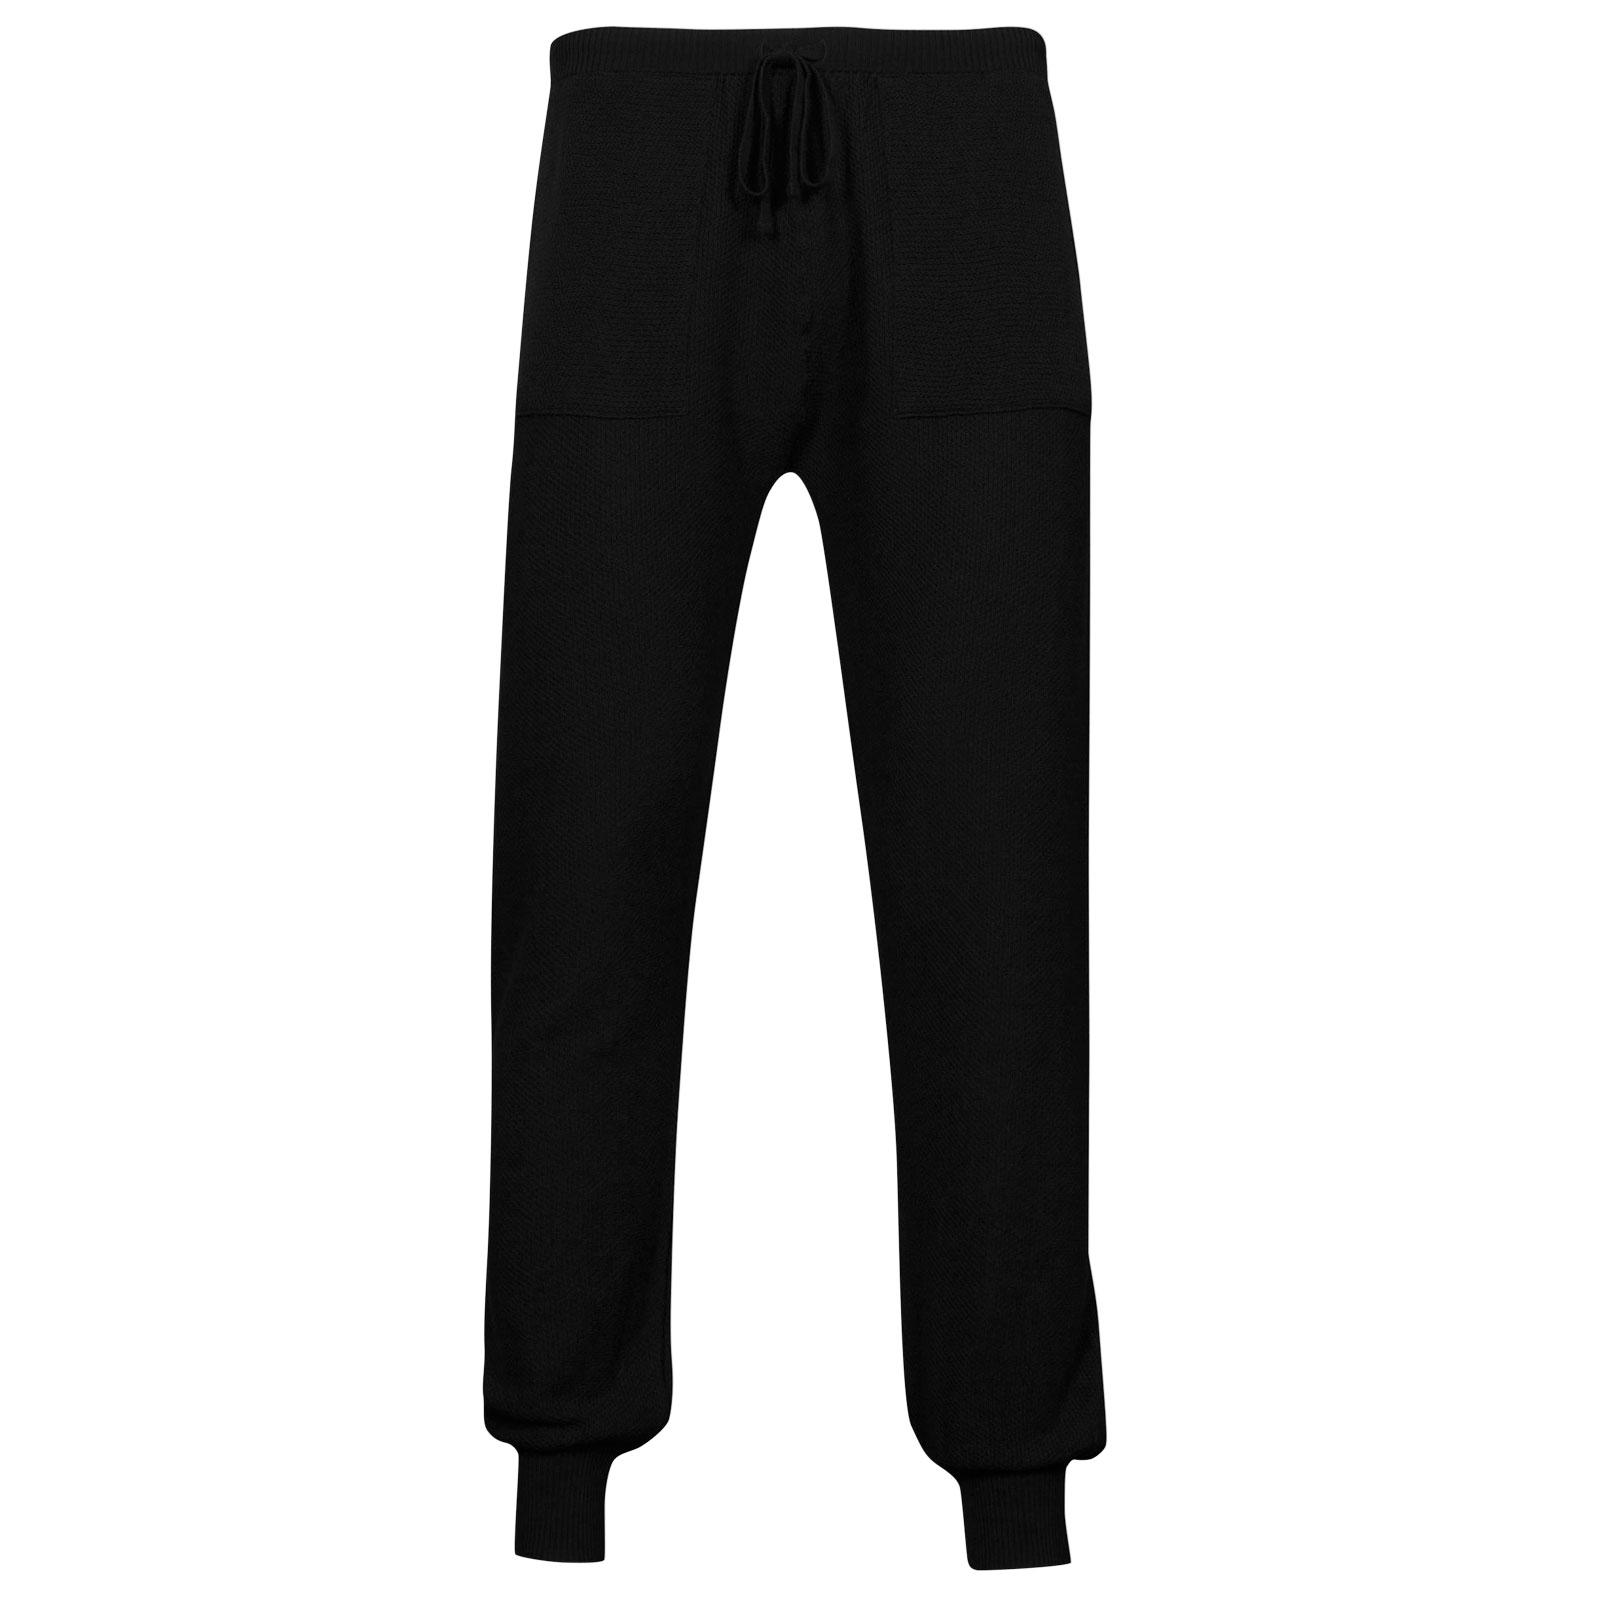 John Smedley 5Singular Merino Wool Trouser in Black-XXL